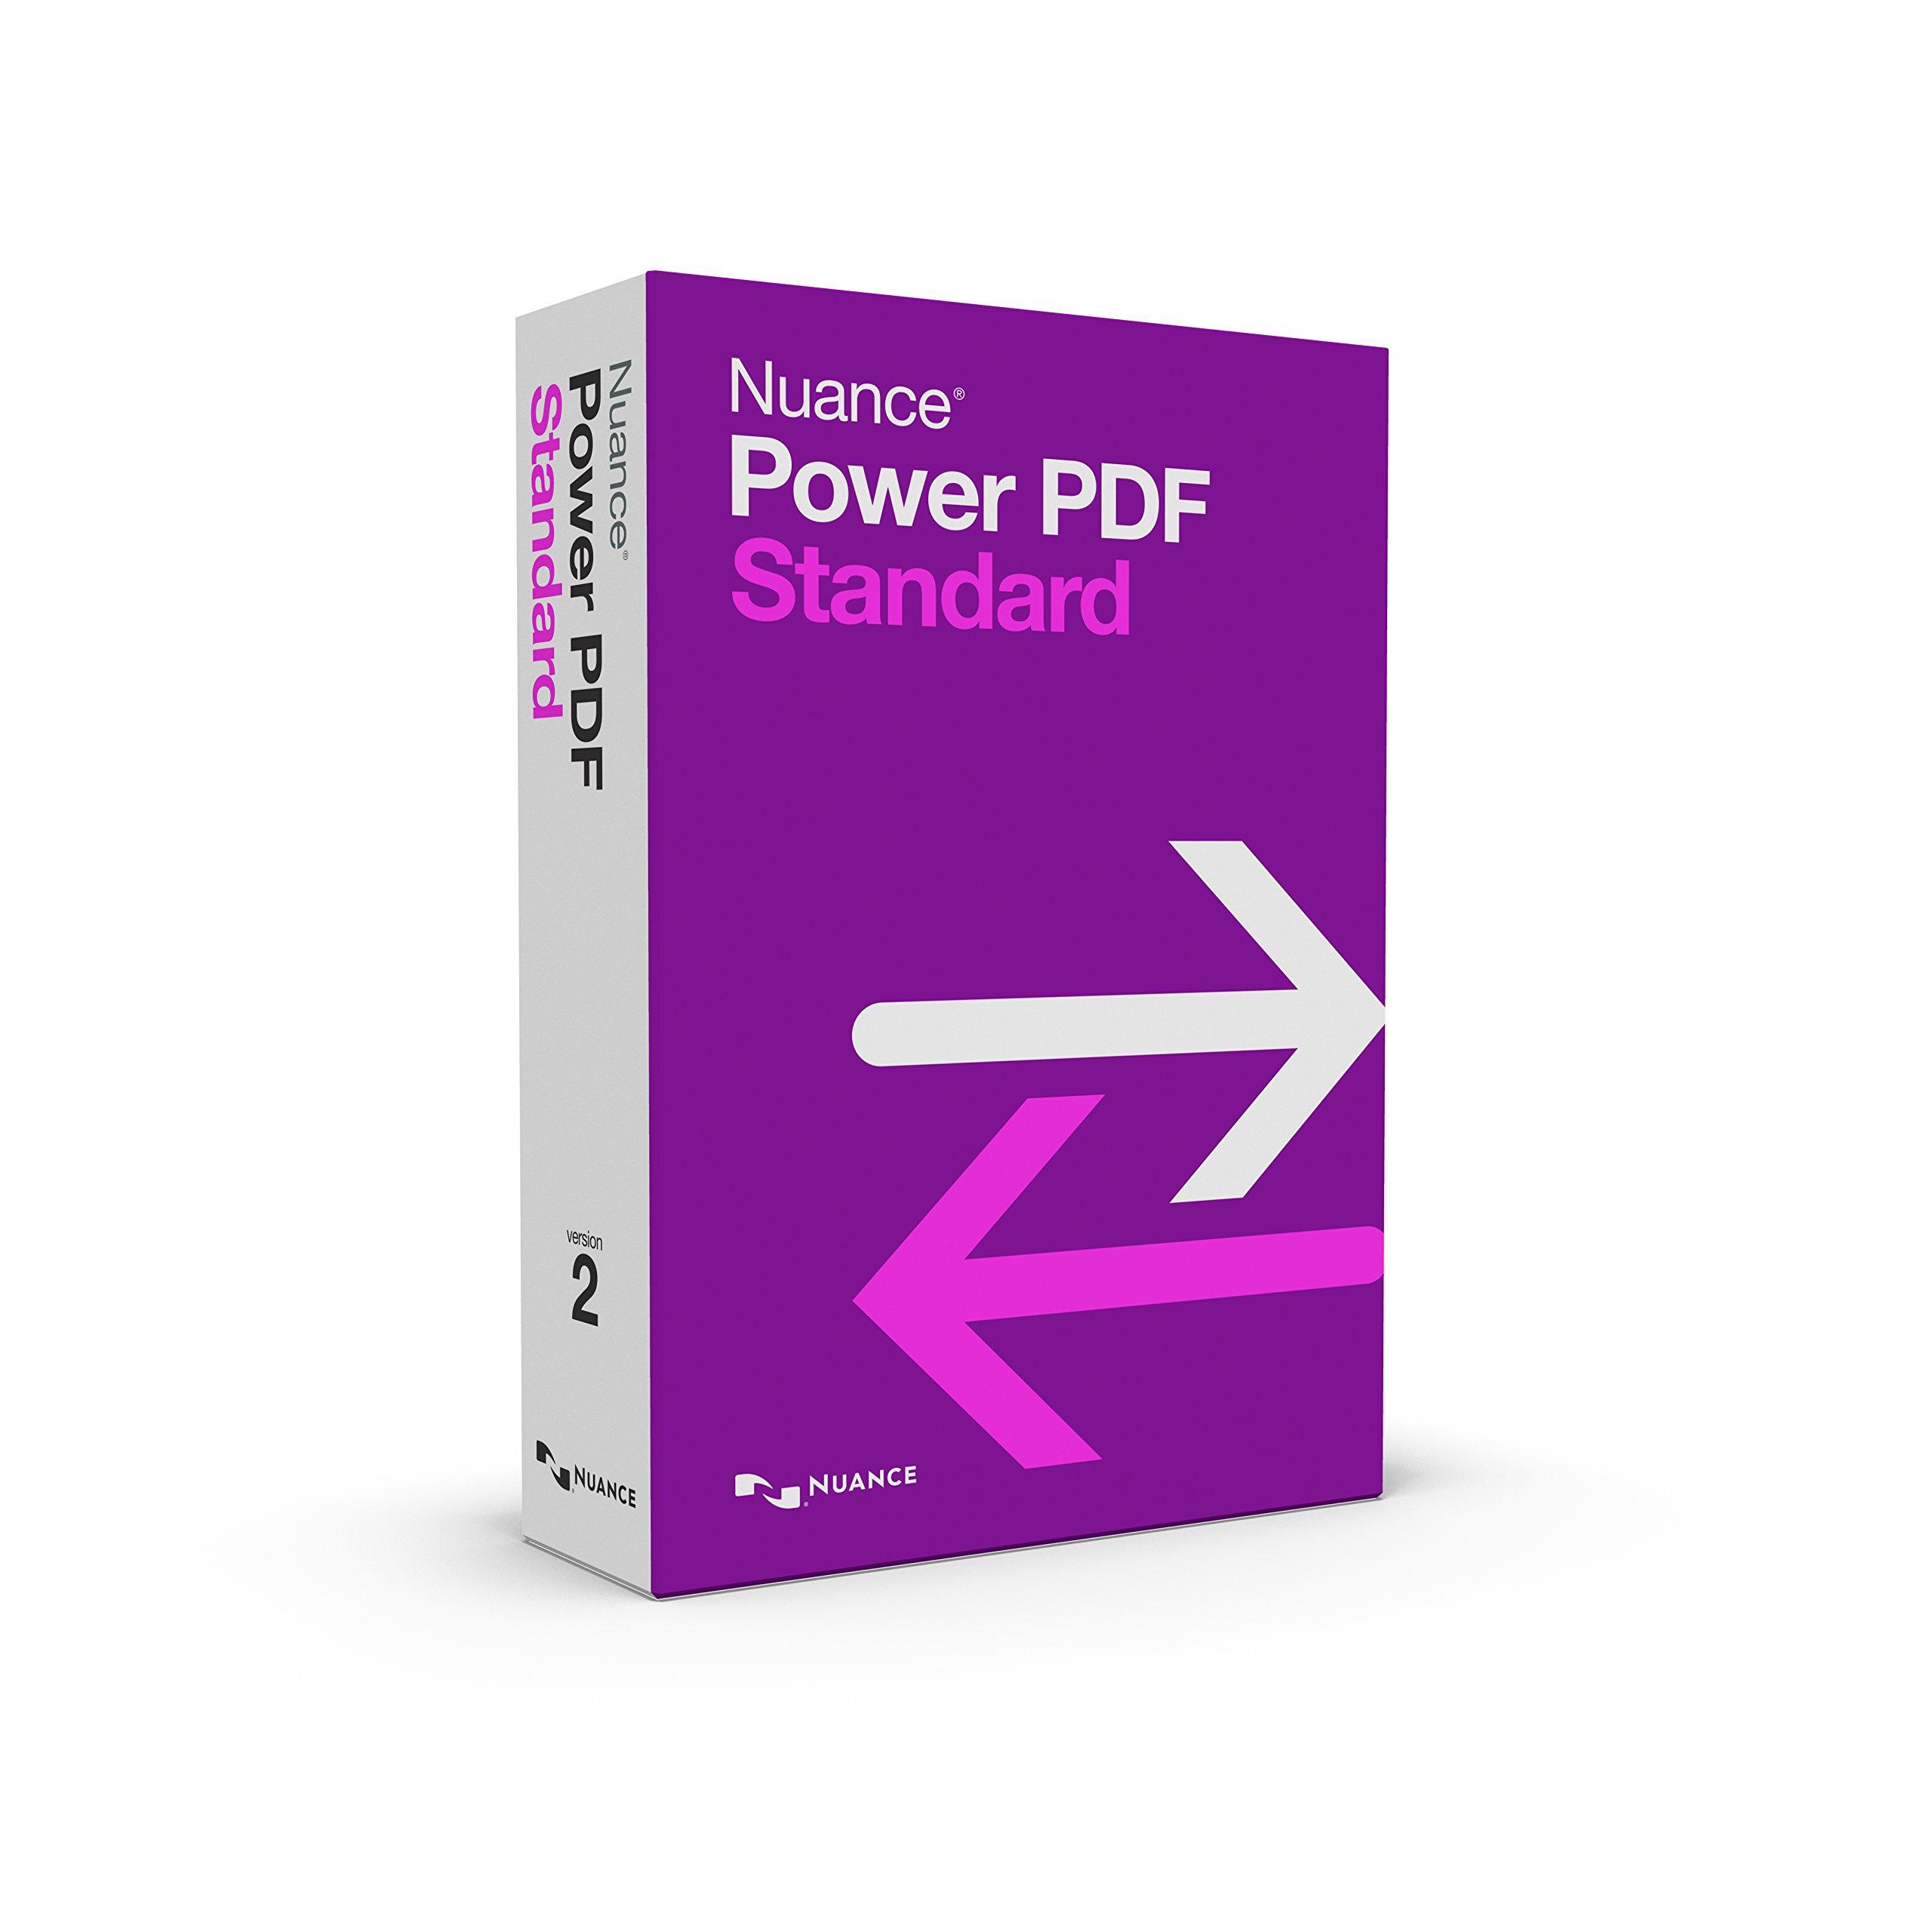 Power PDF Standard 2.0 (Old Version) by Nuance Power PDF